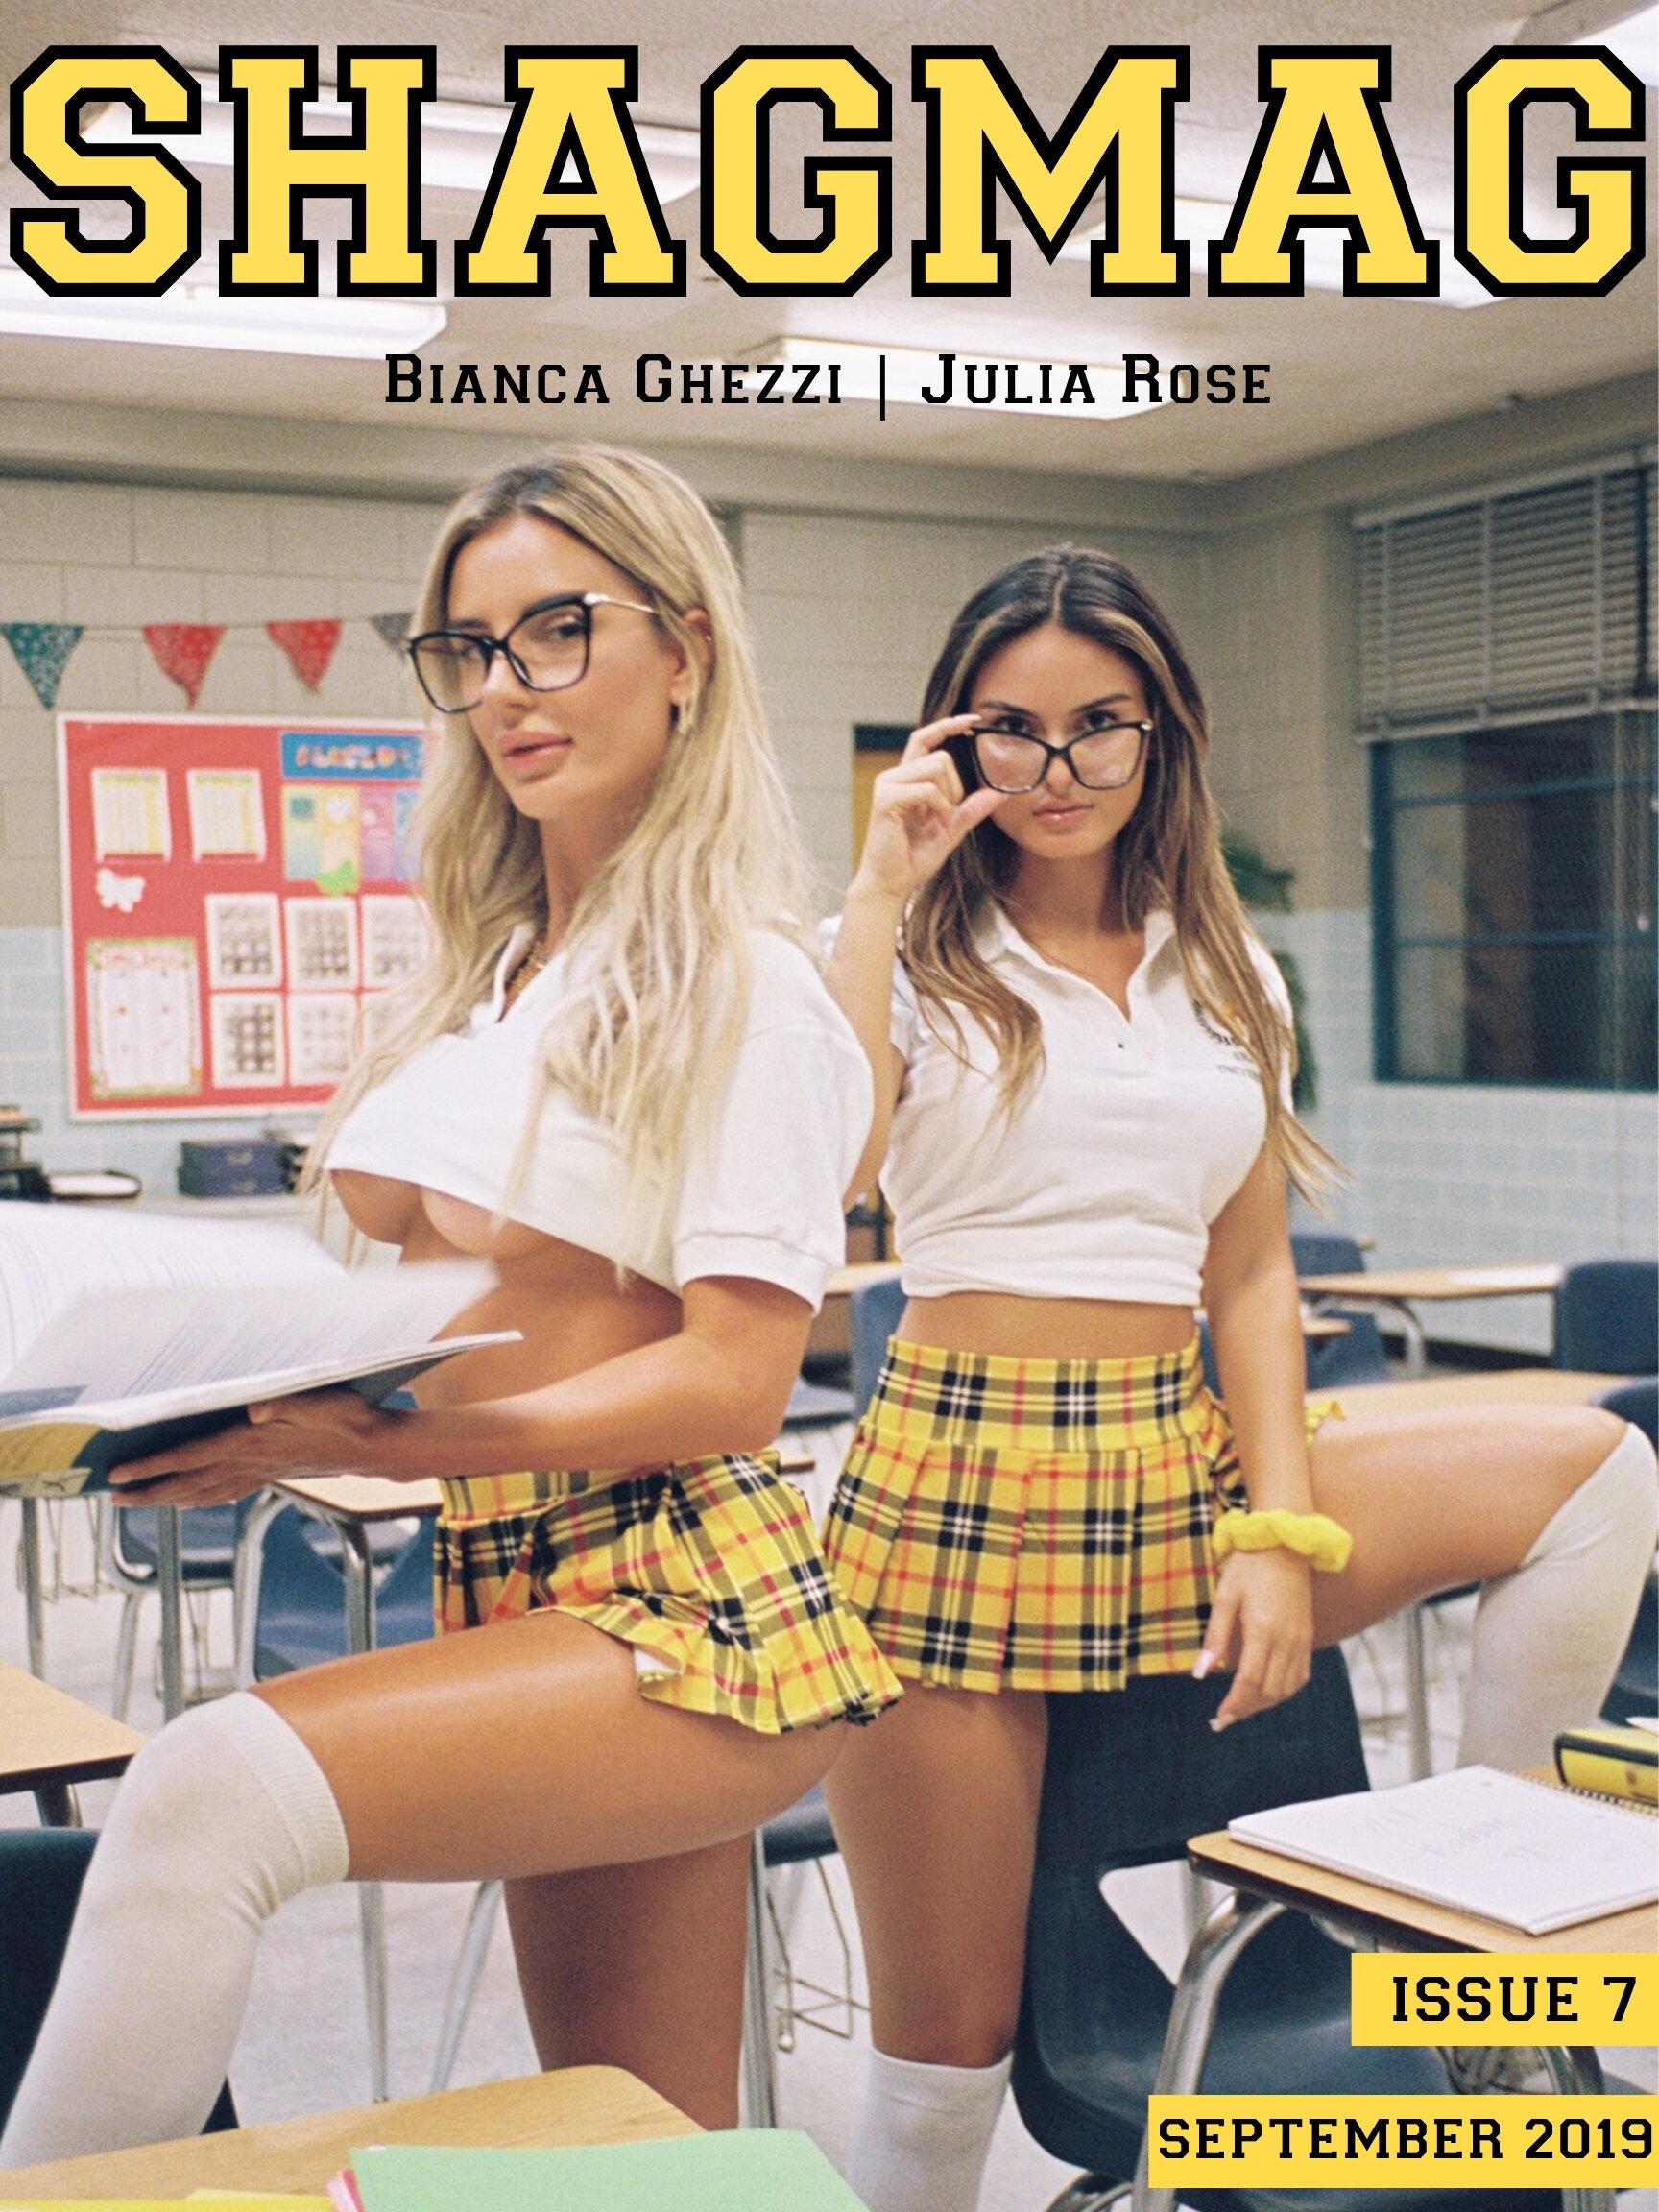 BIANCA GHEZZI - SEPTEMBER 2019 | ISSUE 7